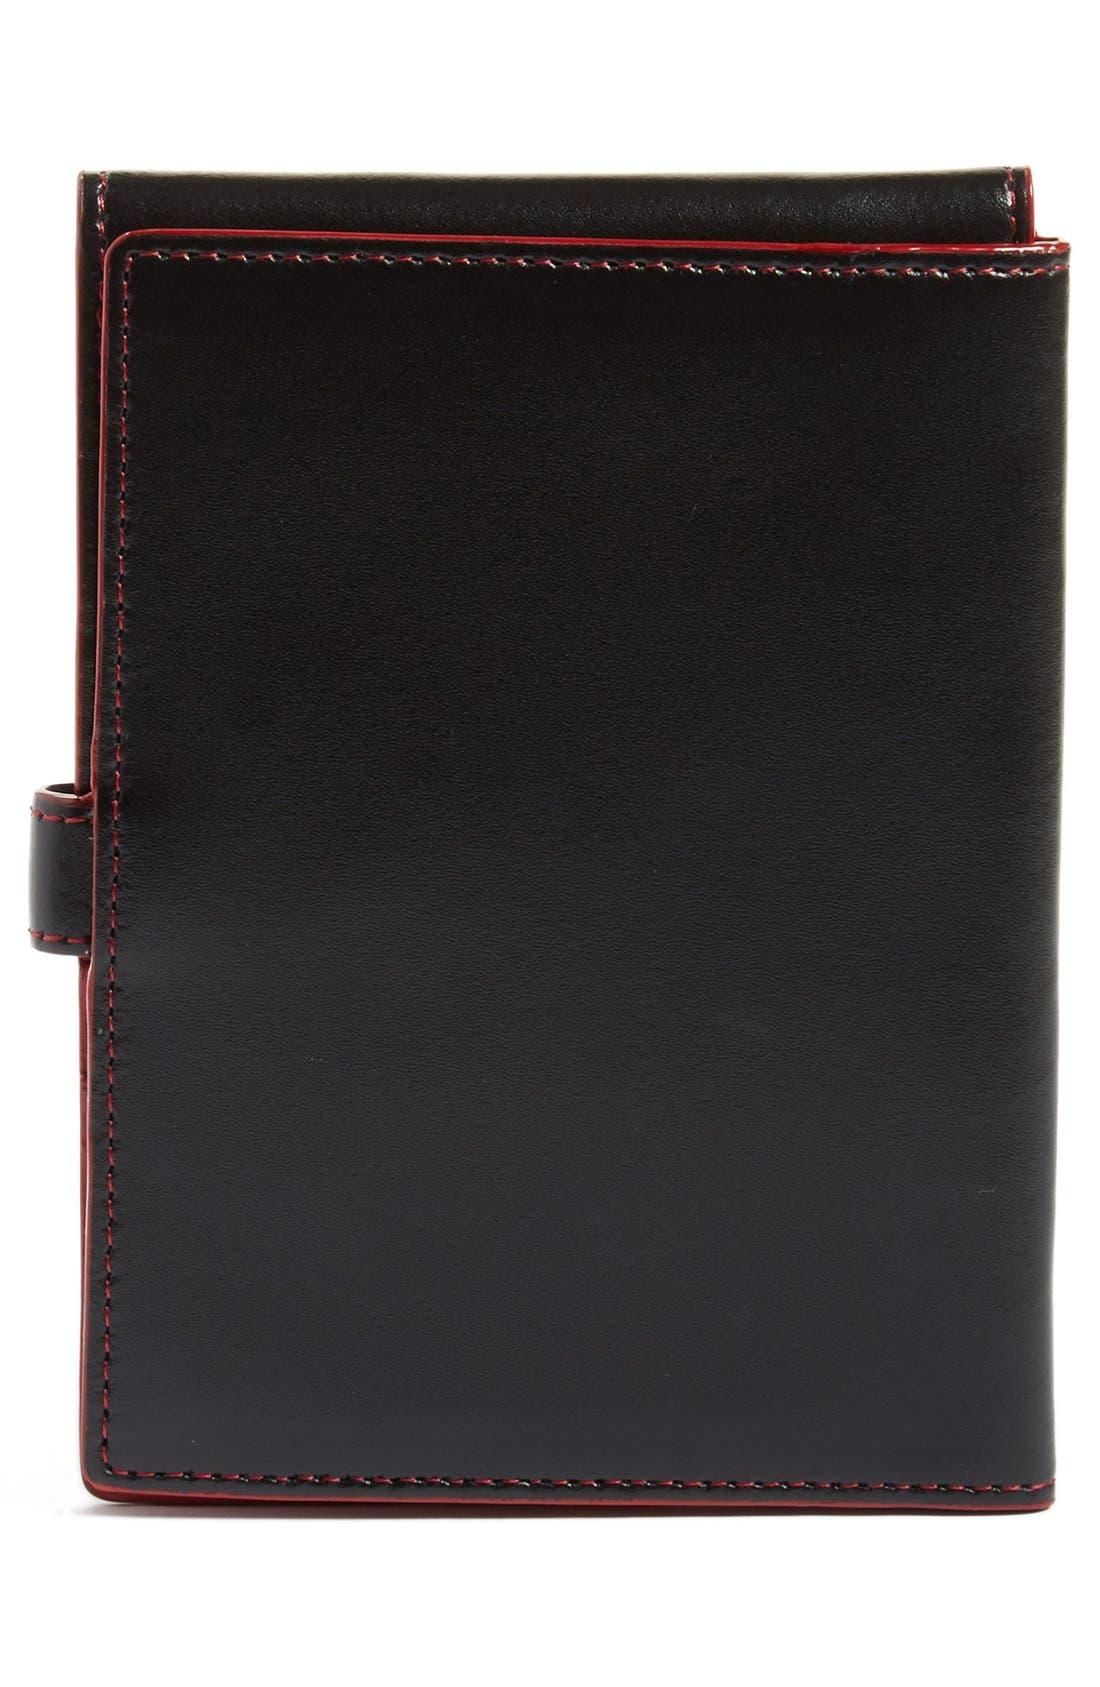 Audrey RFID Leather Passport Wallet,                             Alternate thumbnail 13, color,